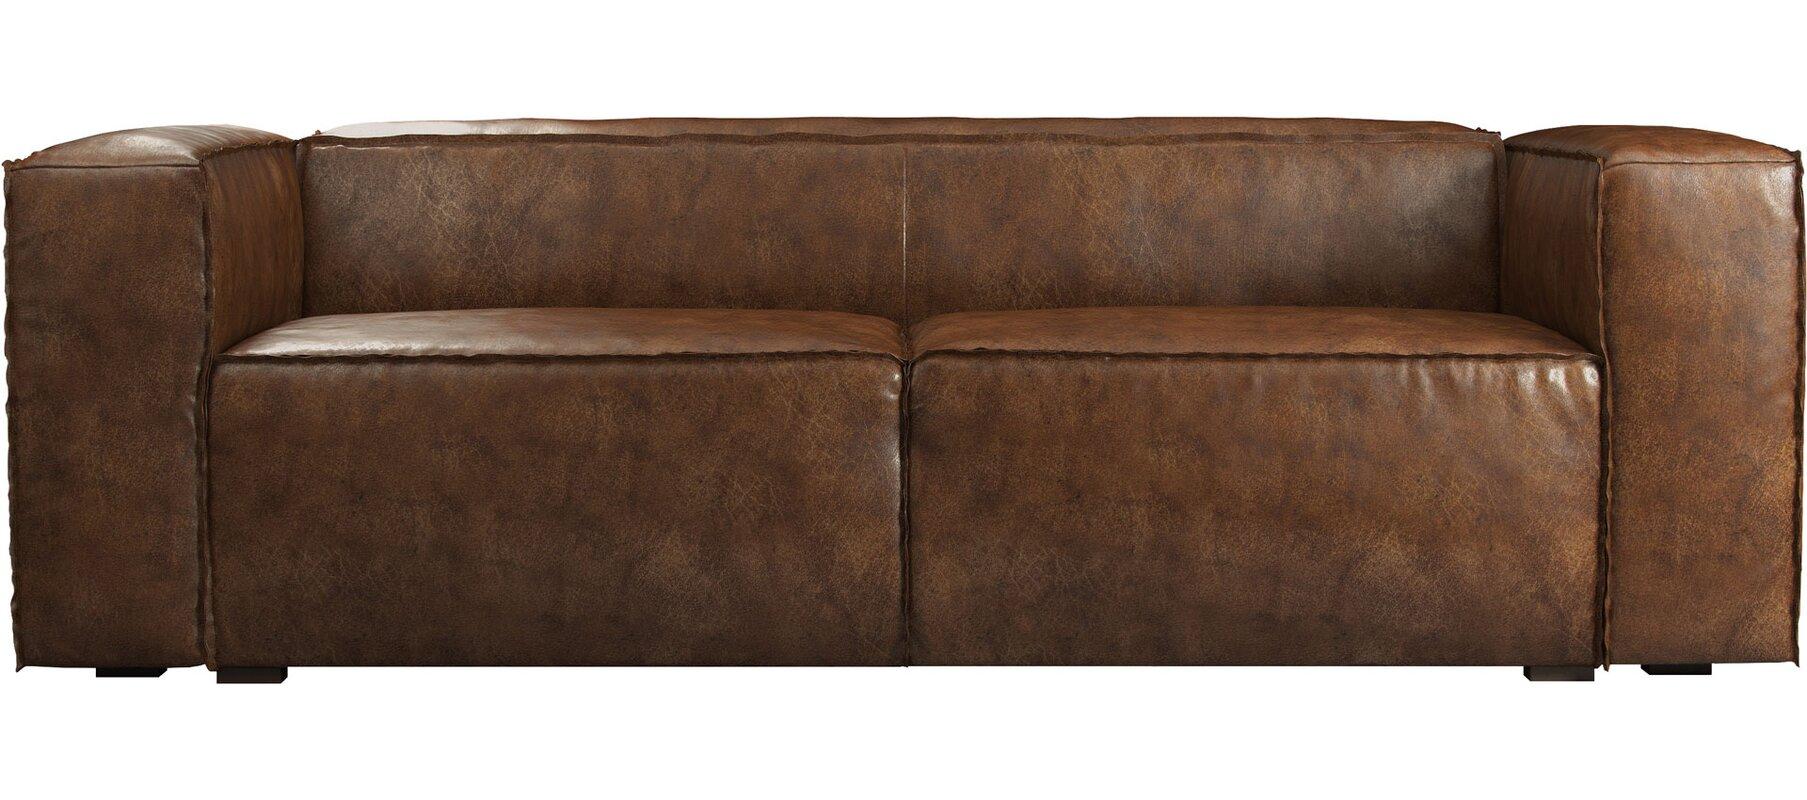 Modloft Dominick Sleeper Sofa Reviews Wayfair ~ Genuine Leather Sleeper Sofa